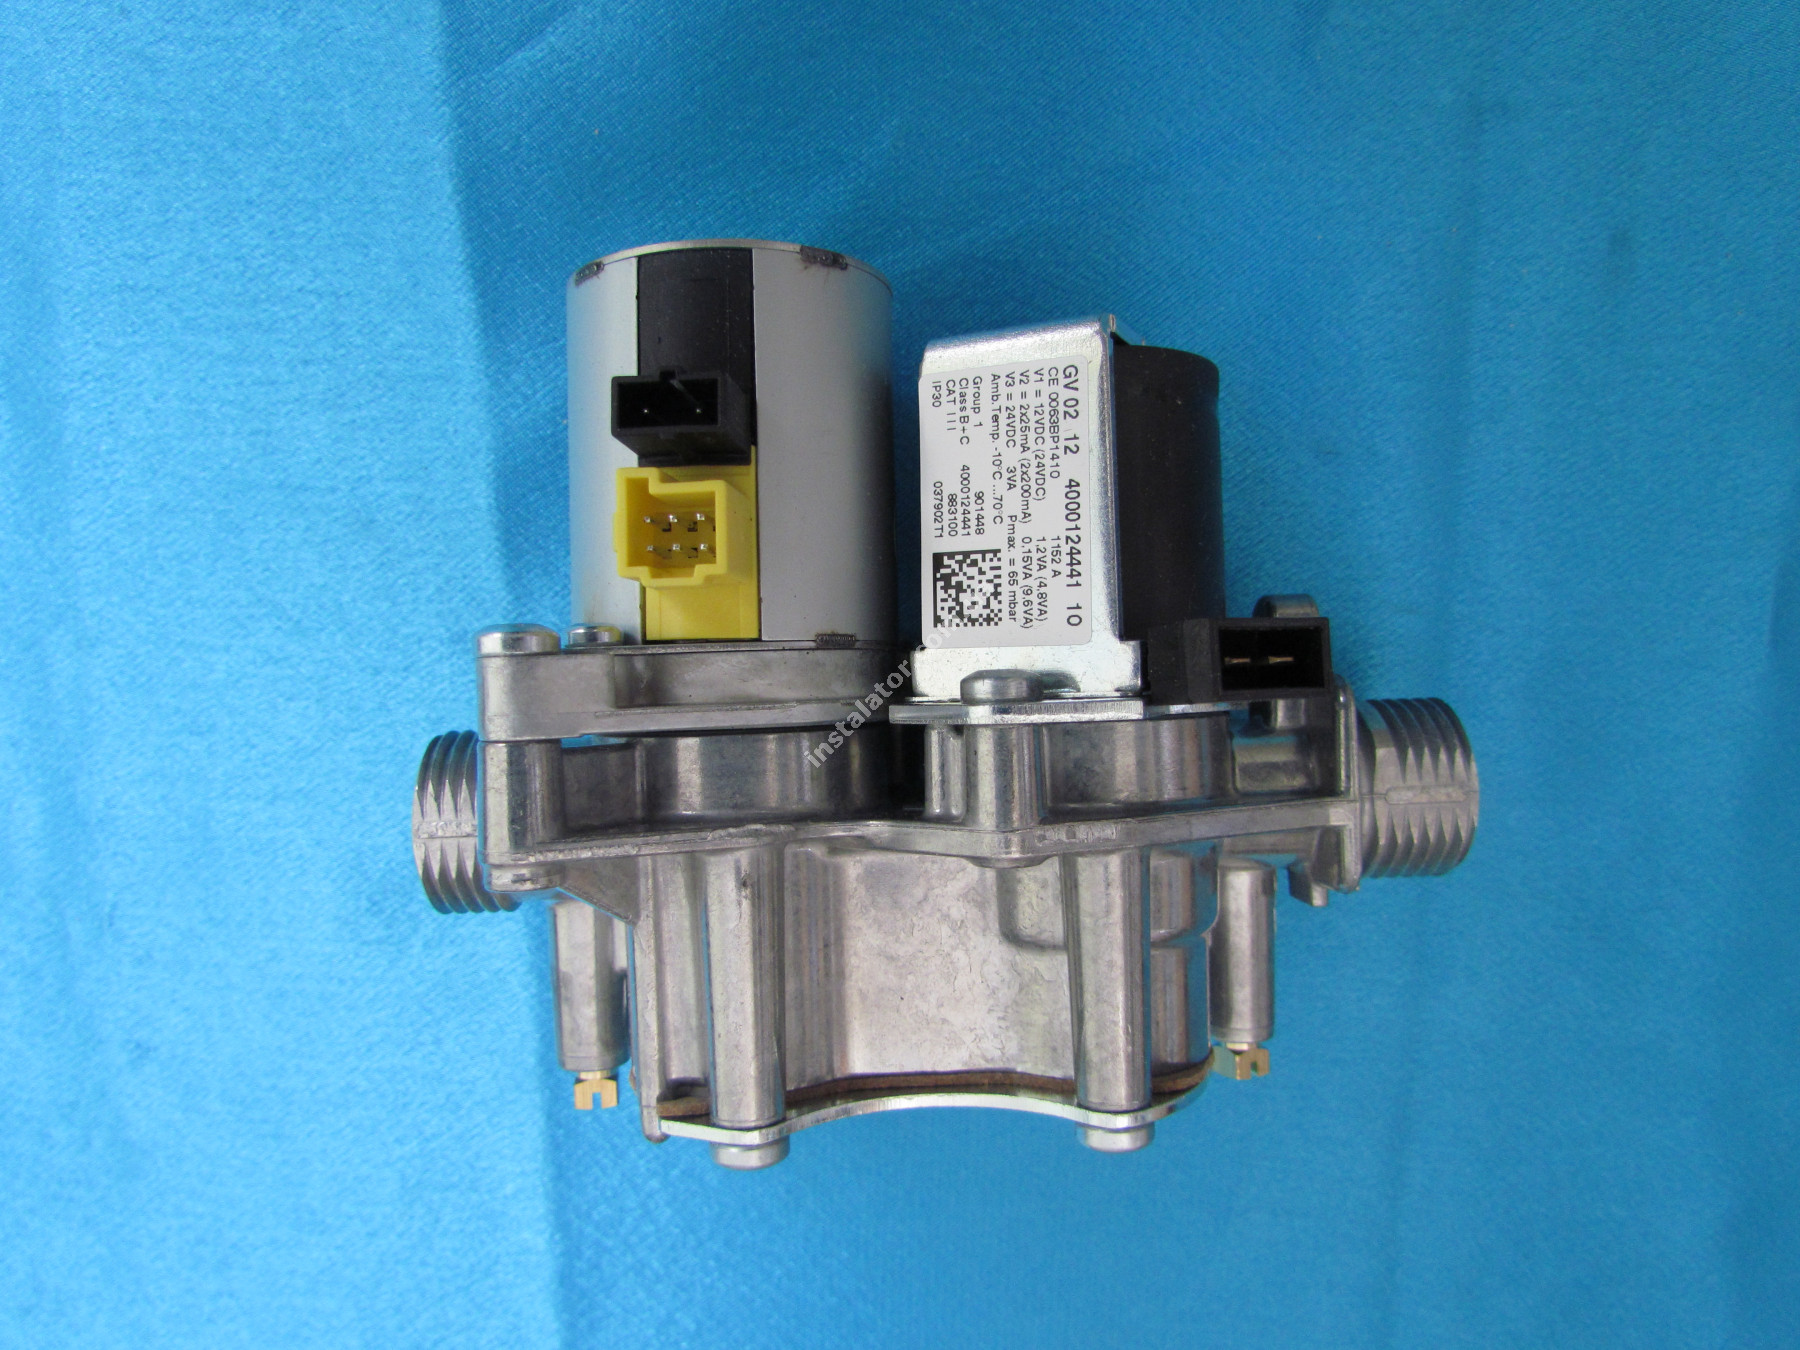 0020019991 Газовий клапан VAILLANT atmoTEC Pro / turboTEC Pro full-image-2